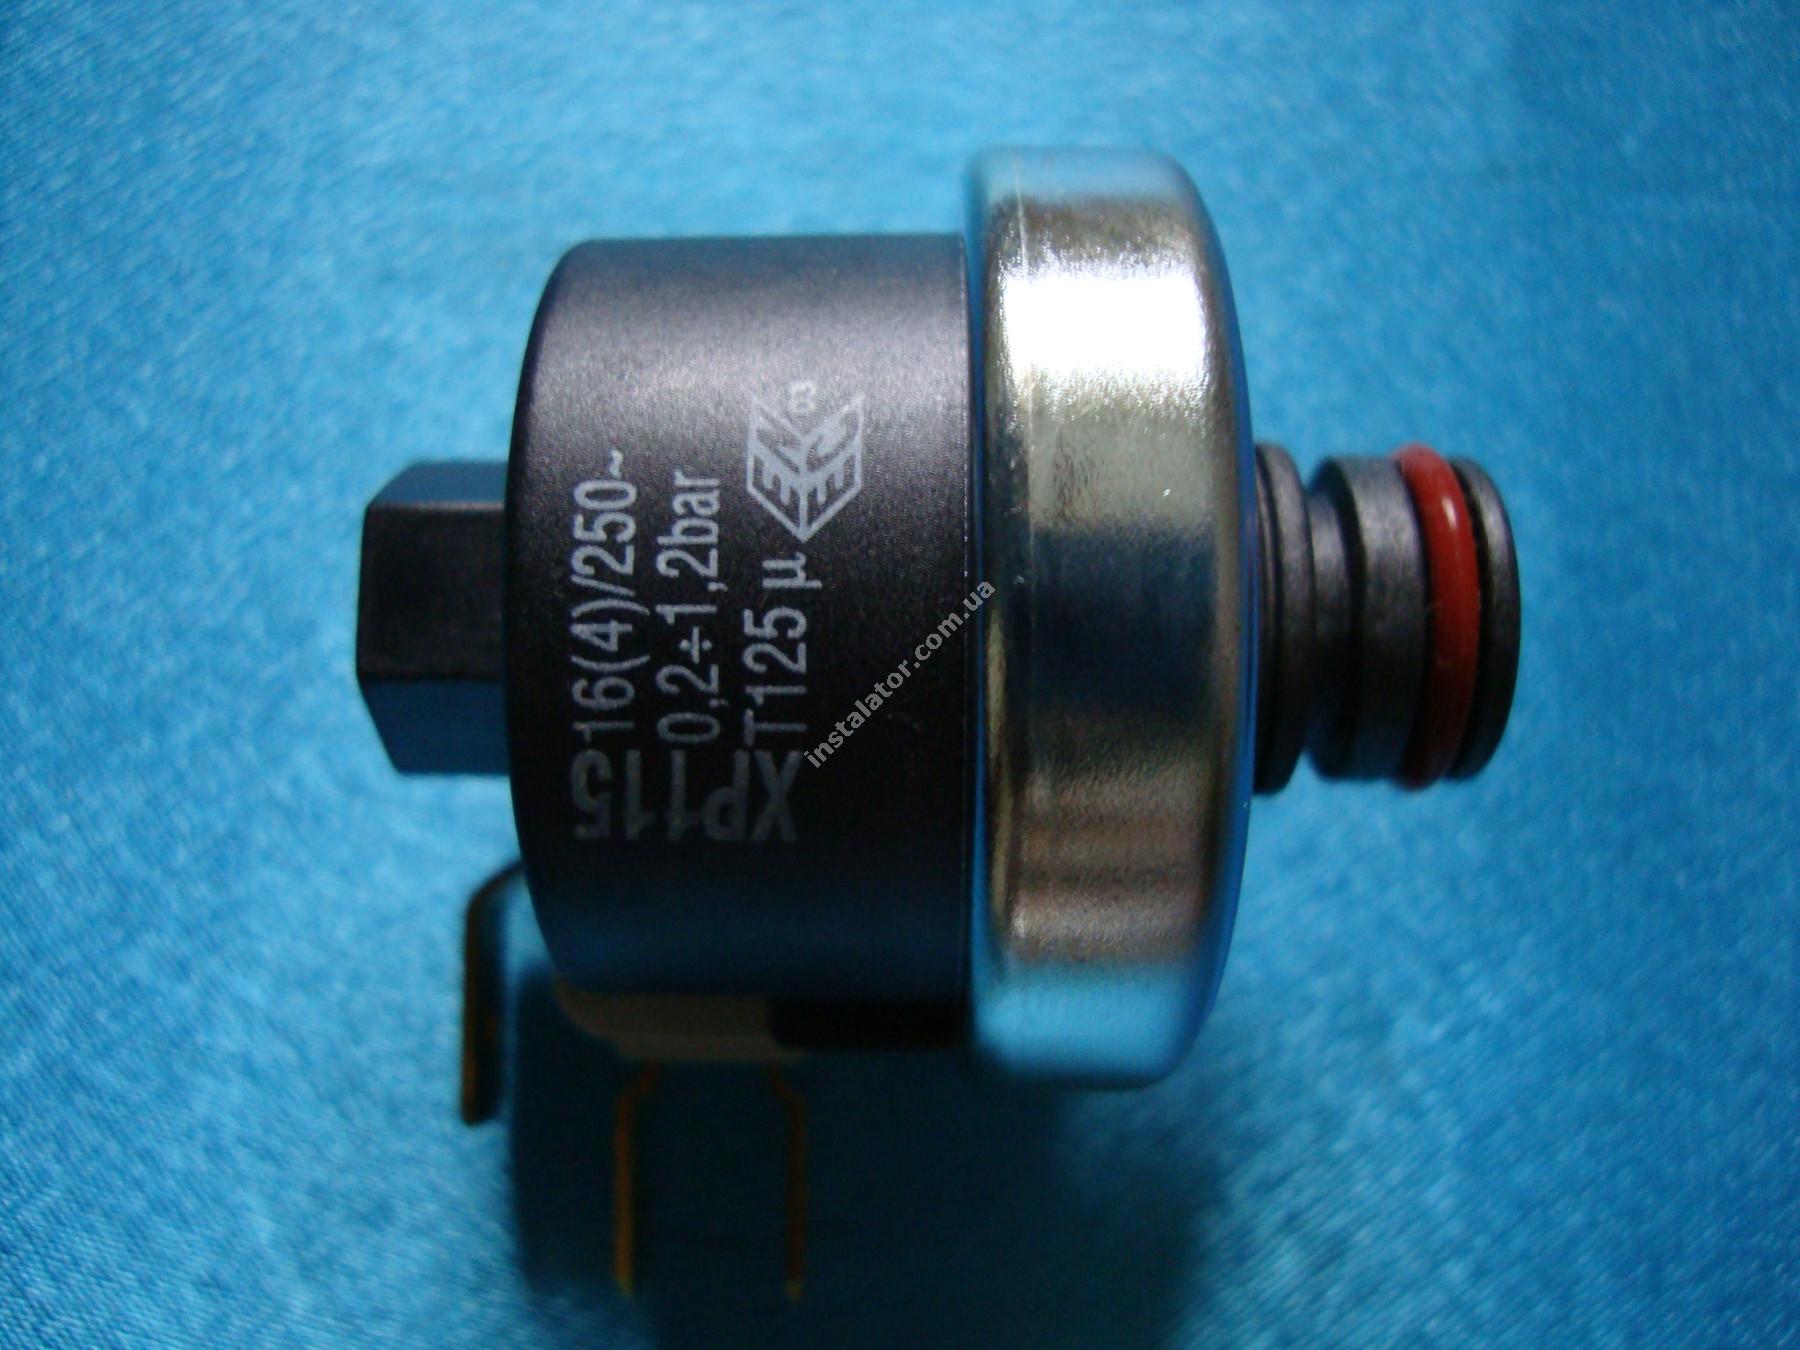 6PRESSAC01 Реле давления воды Vela Compact 0,2-1,2 бар full-image-7